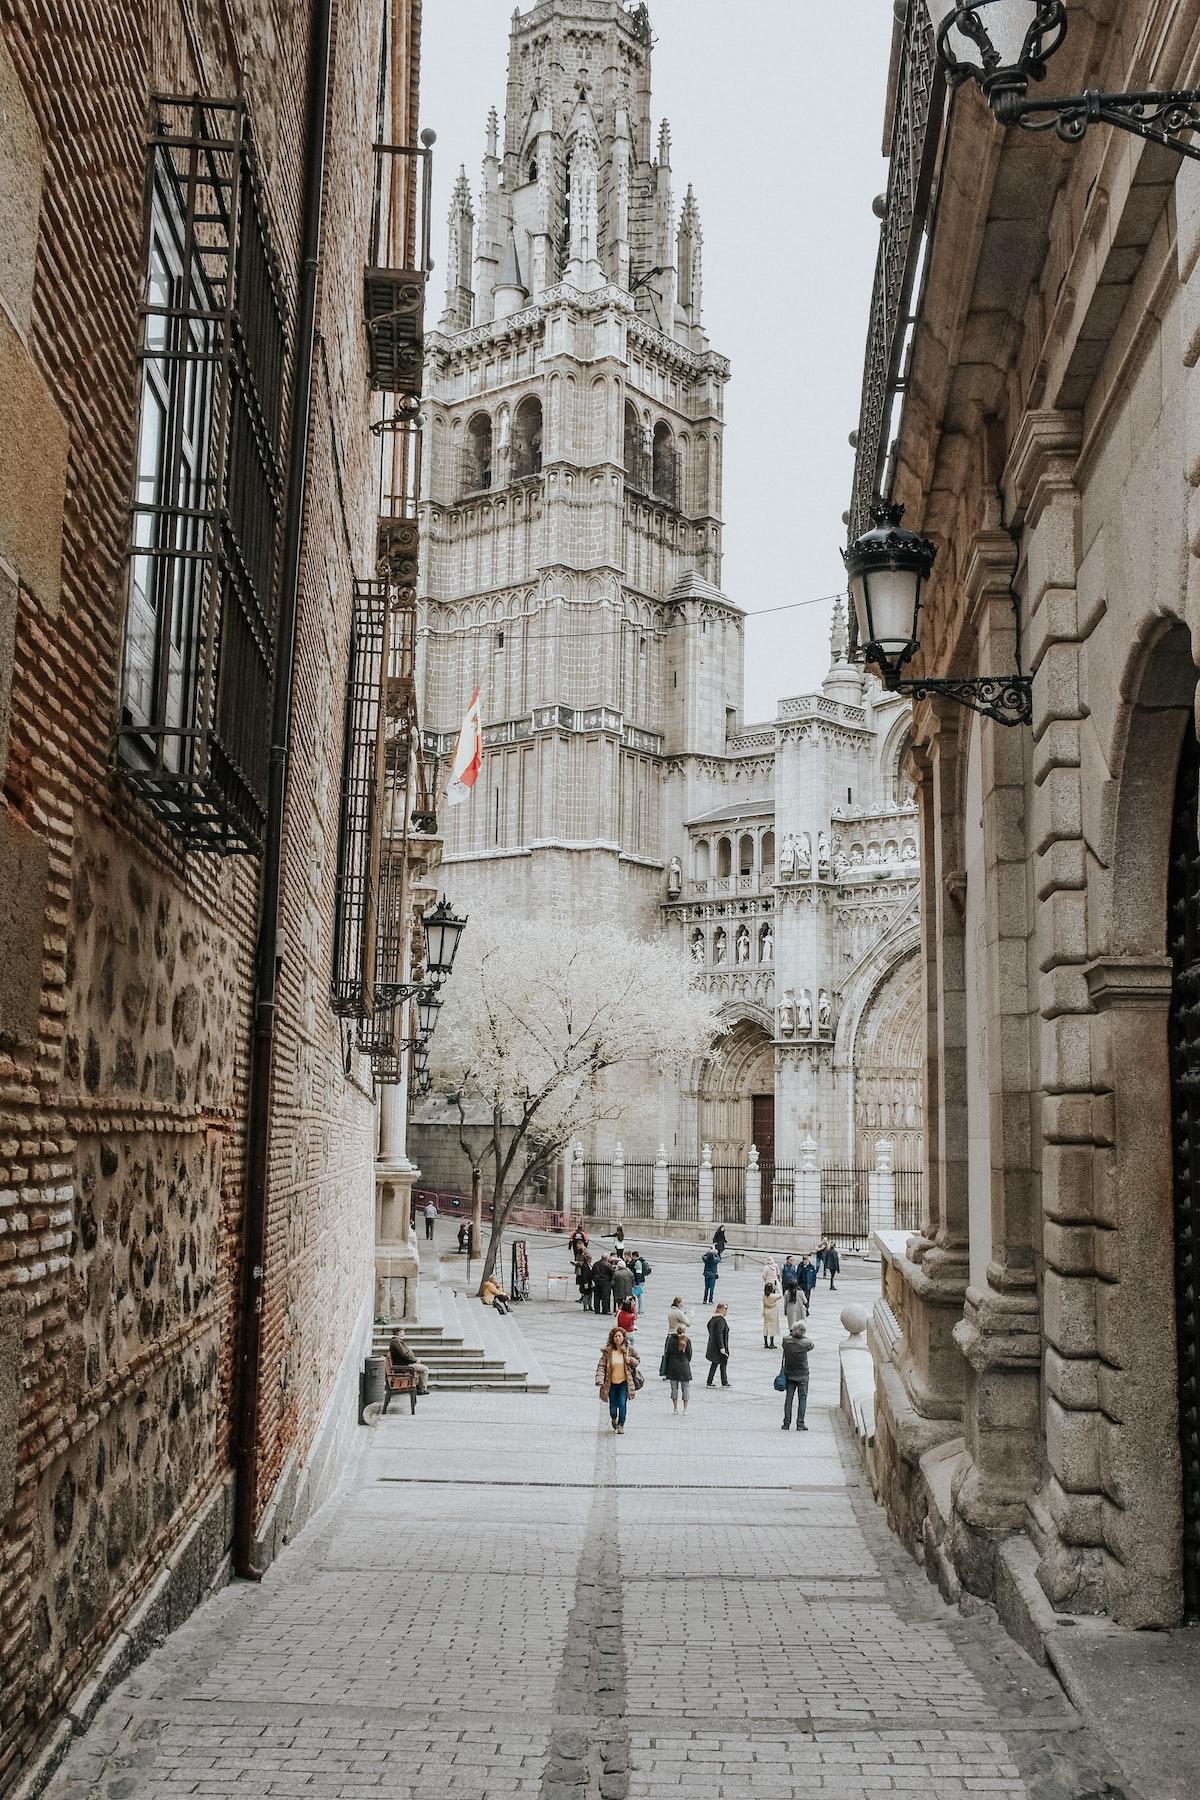 Calle frente a una gran catedral de piedra.